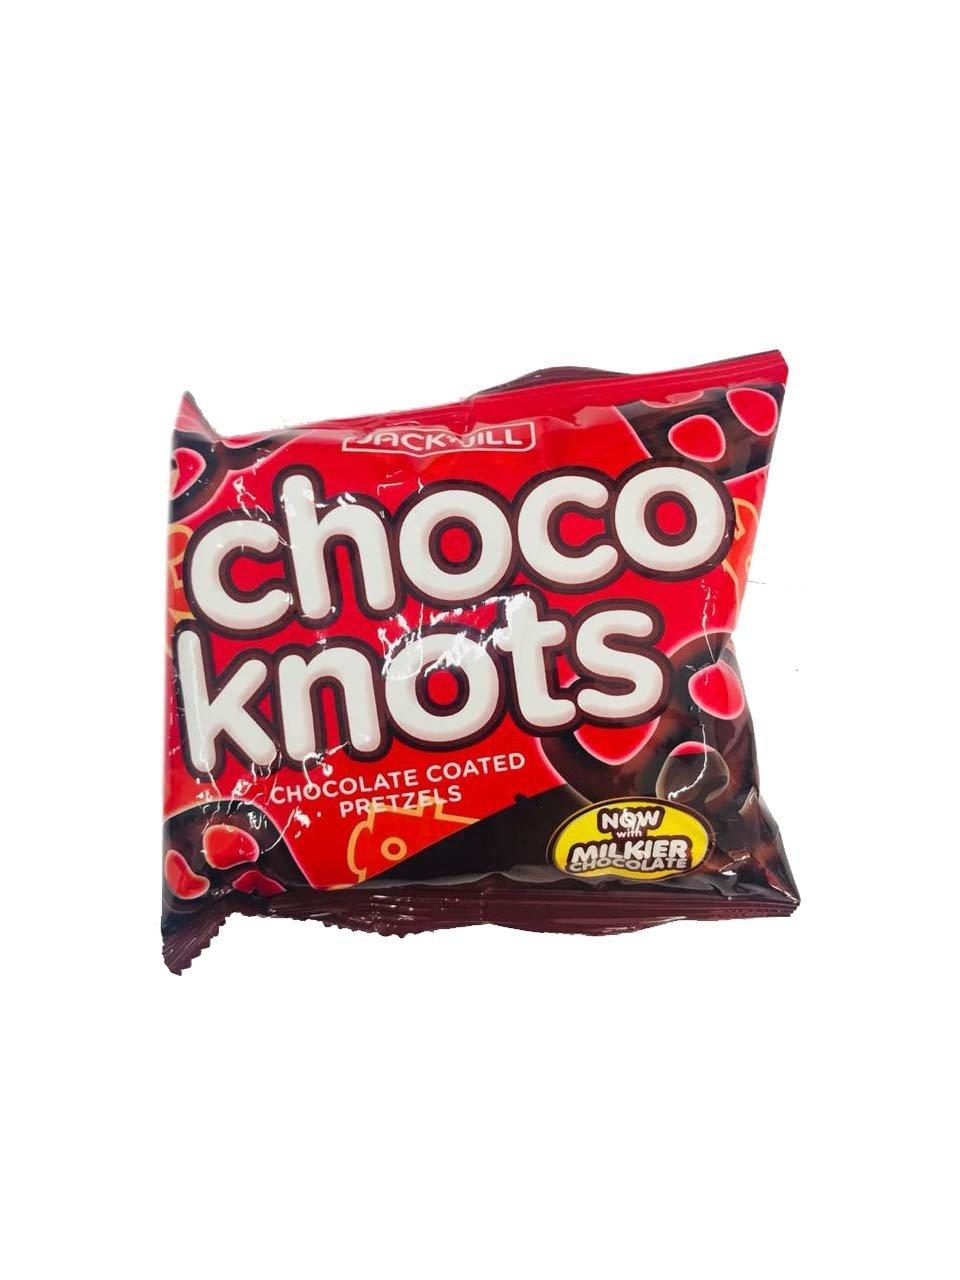 Choco Knots Chocolate Coated Pretzels 28g